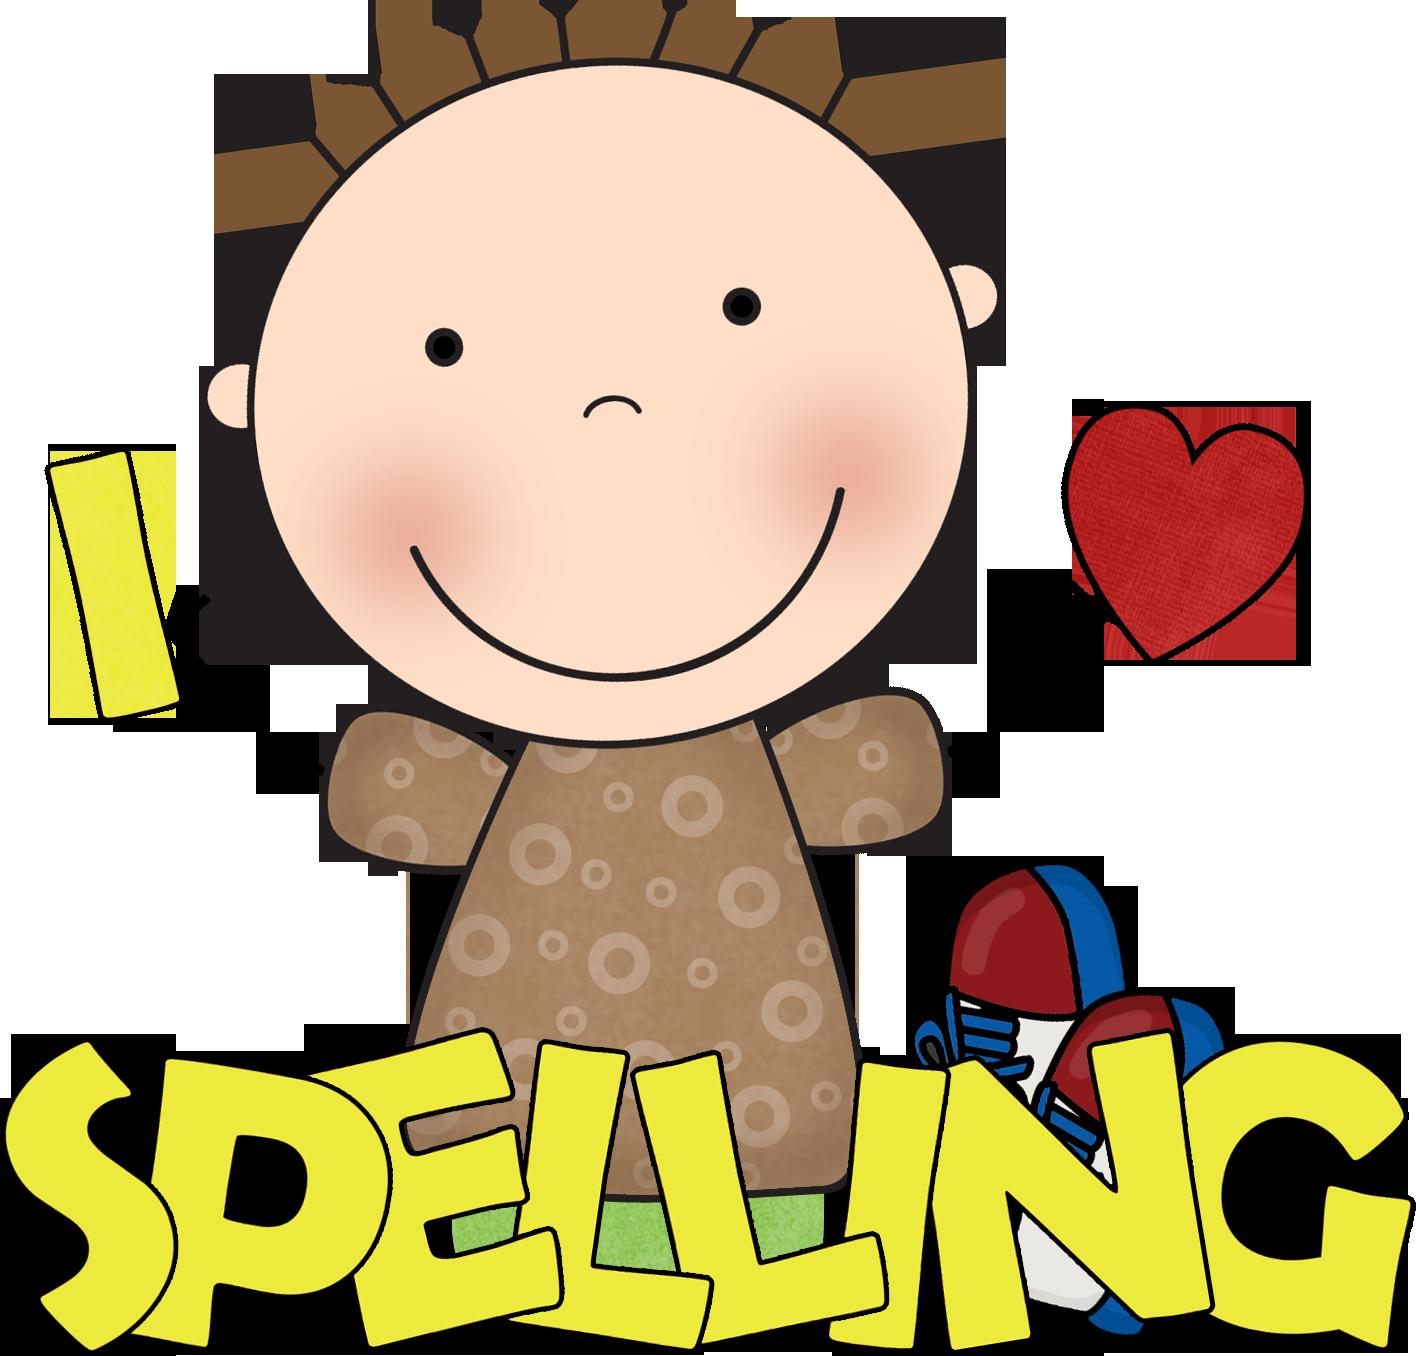 Spelling class clipartfox. Homework clipart word